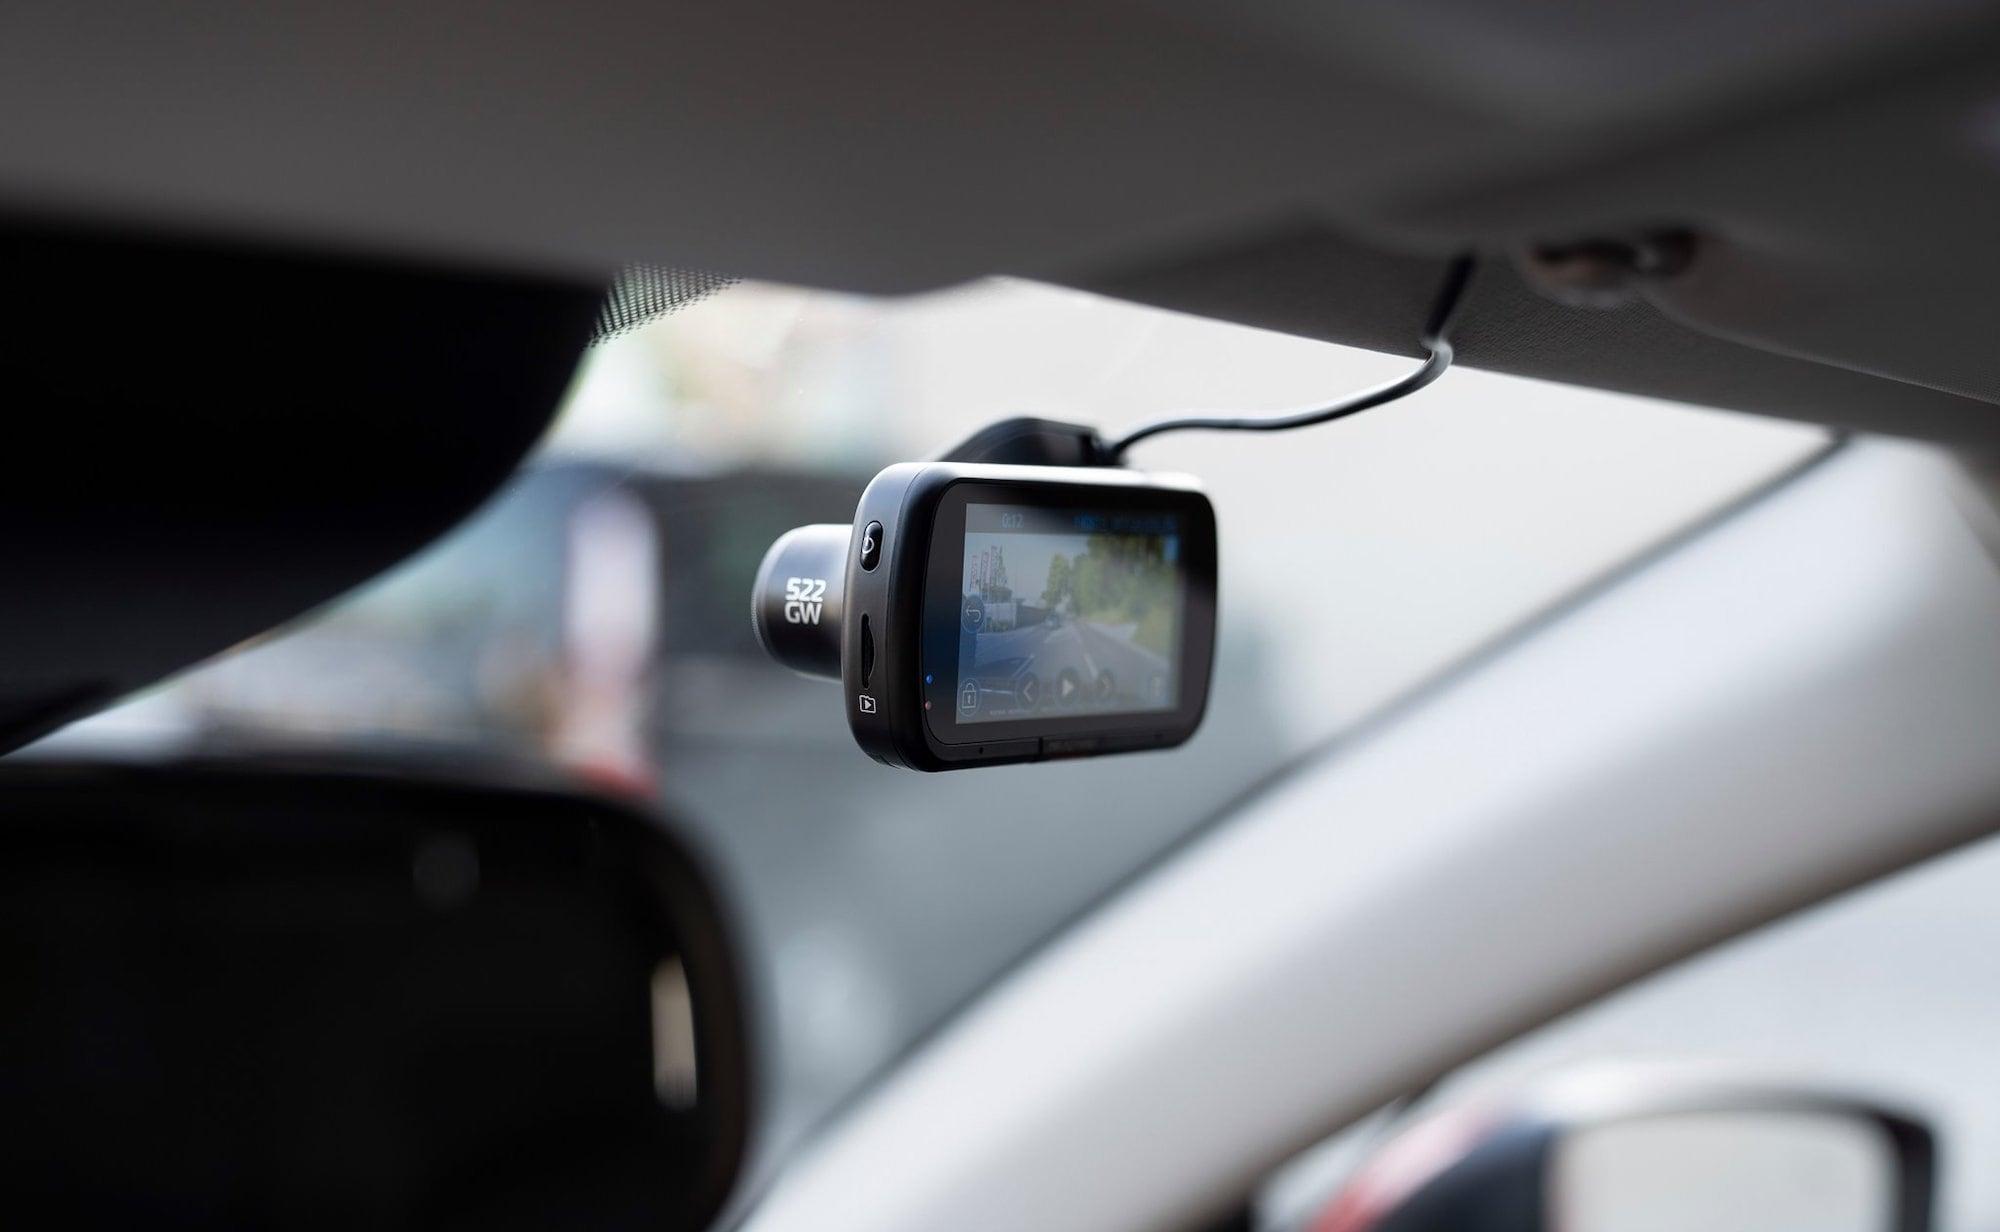 Nextbase 522GW Alexa Dash Cam provides crystal-clear 1440p HD resolution